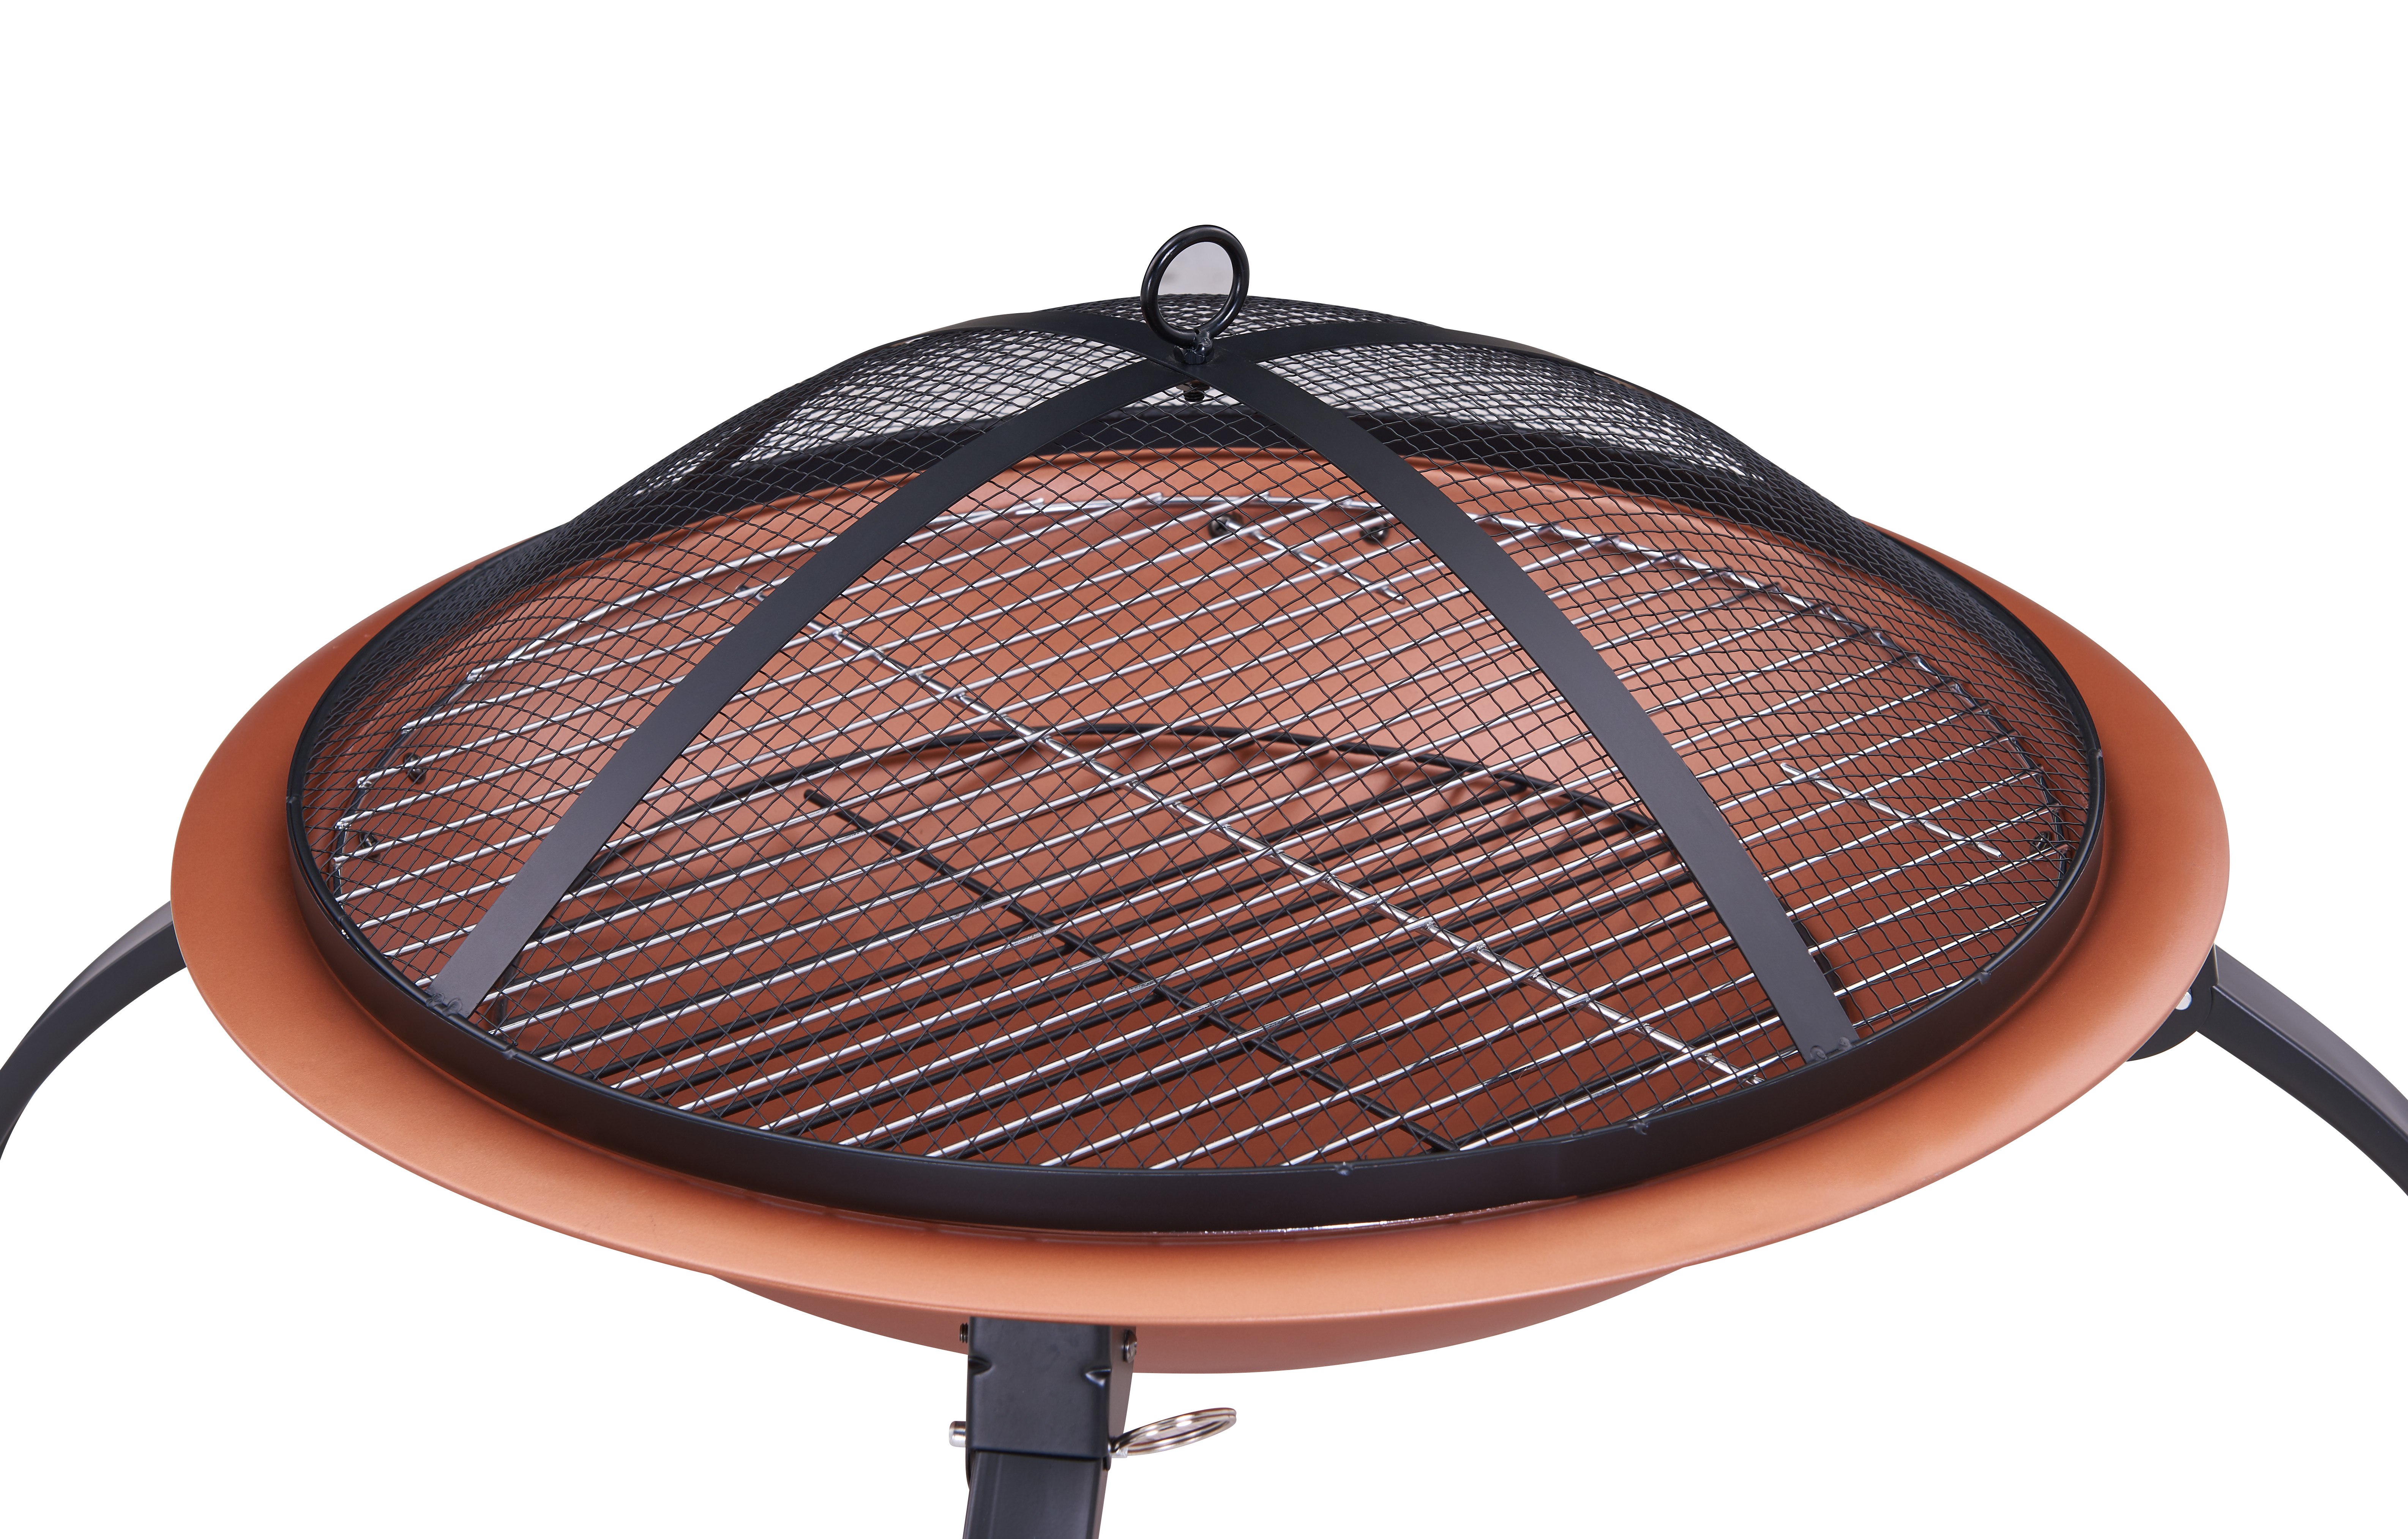 Livivo Copper Round Fire Pit Patio Garden Bowl Outdoor